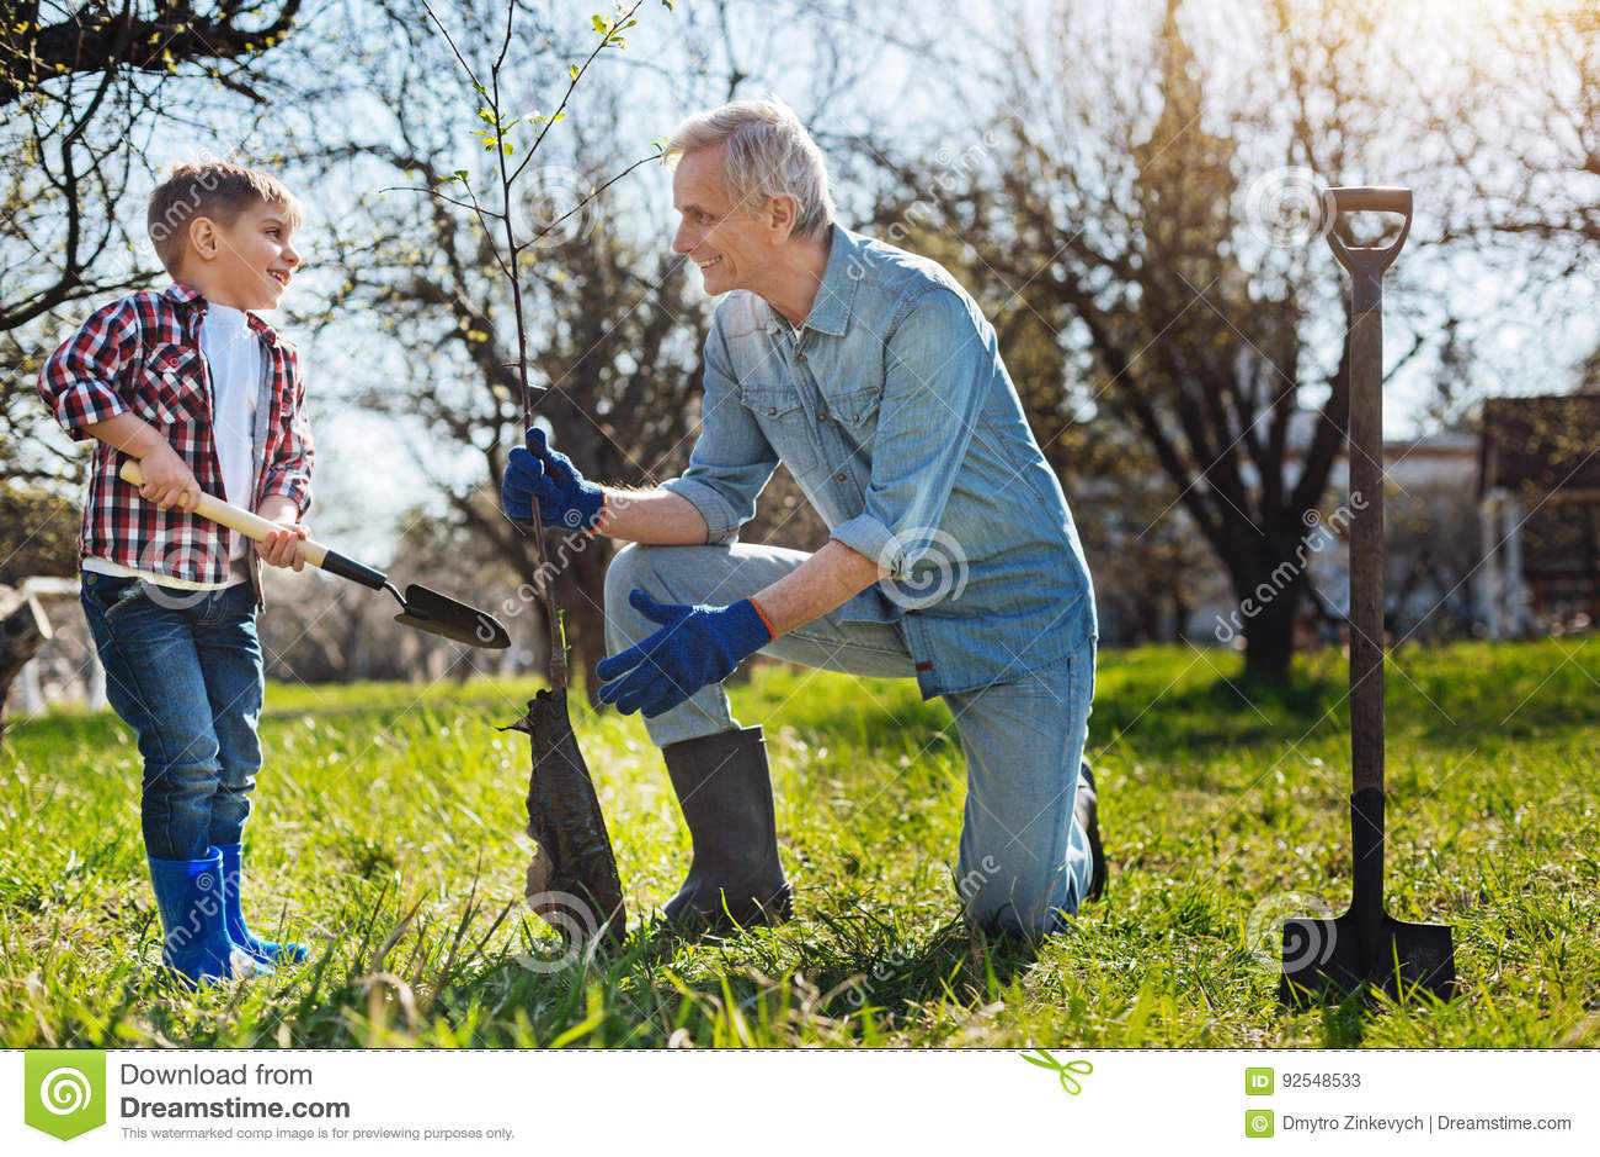 excited senior gardener and kid setting tree in garden stock photo